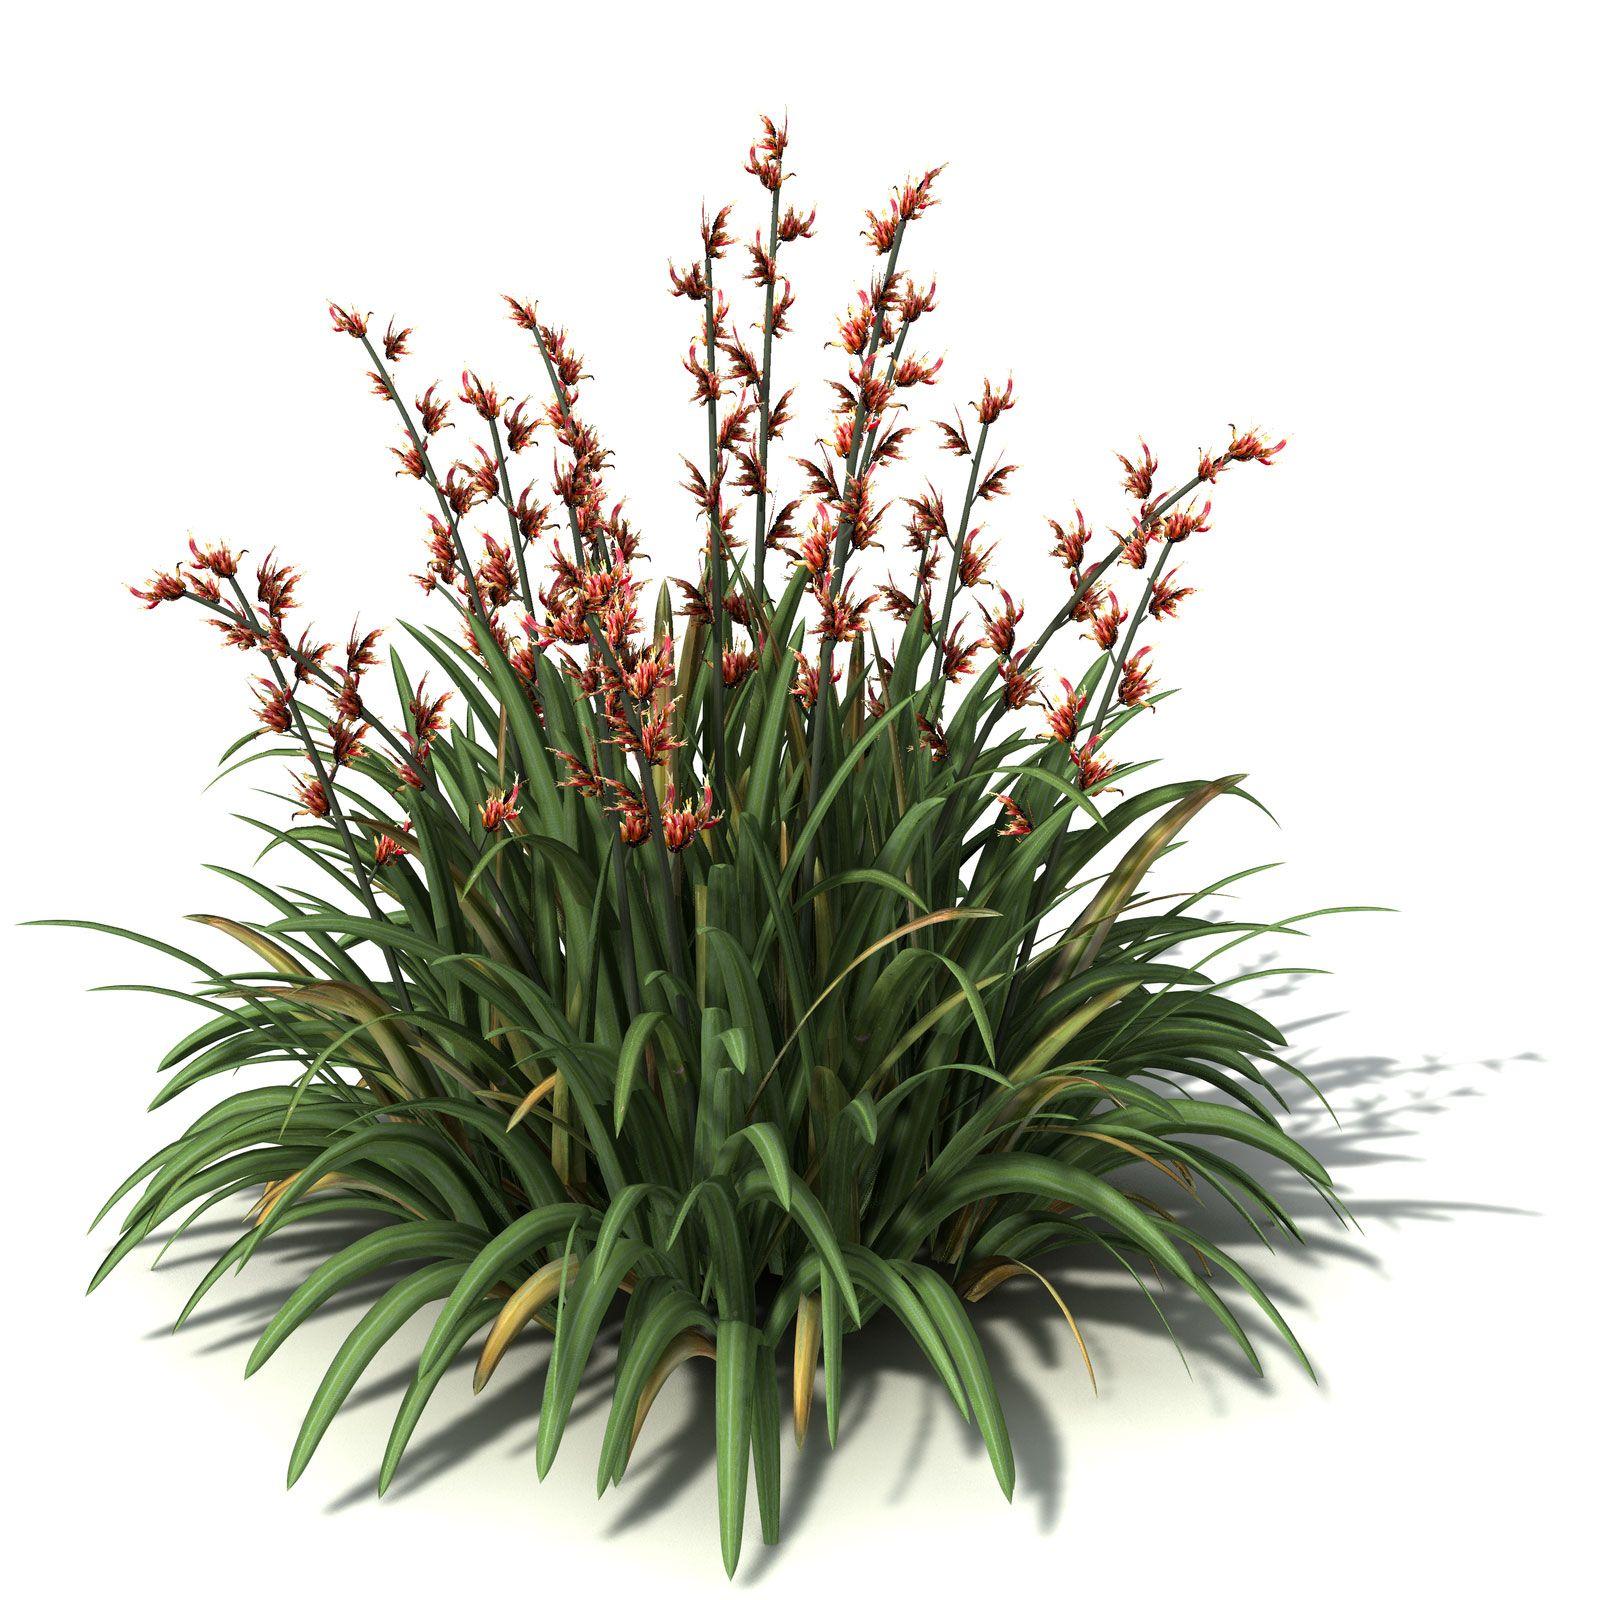 New Zealand Flax 2d Beautiful Flowers Wallpapers Tree Plan Png Garden Illustration